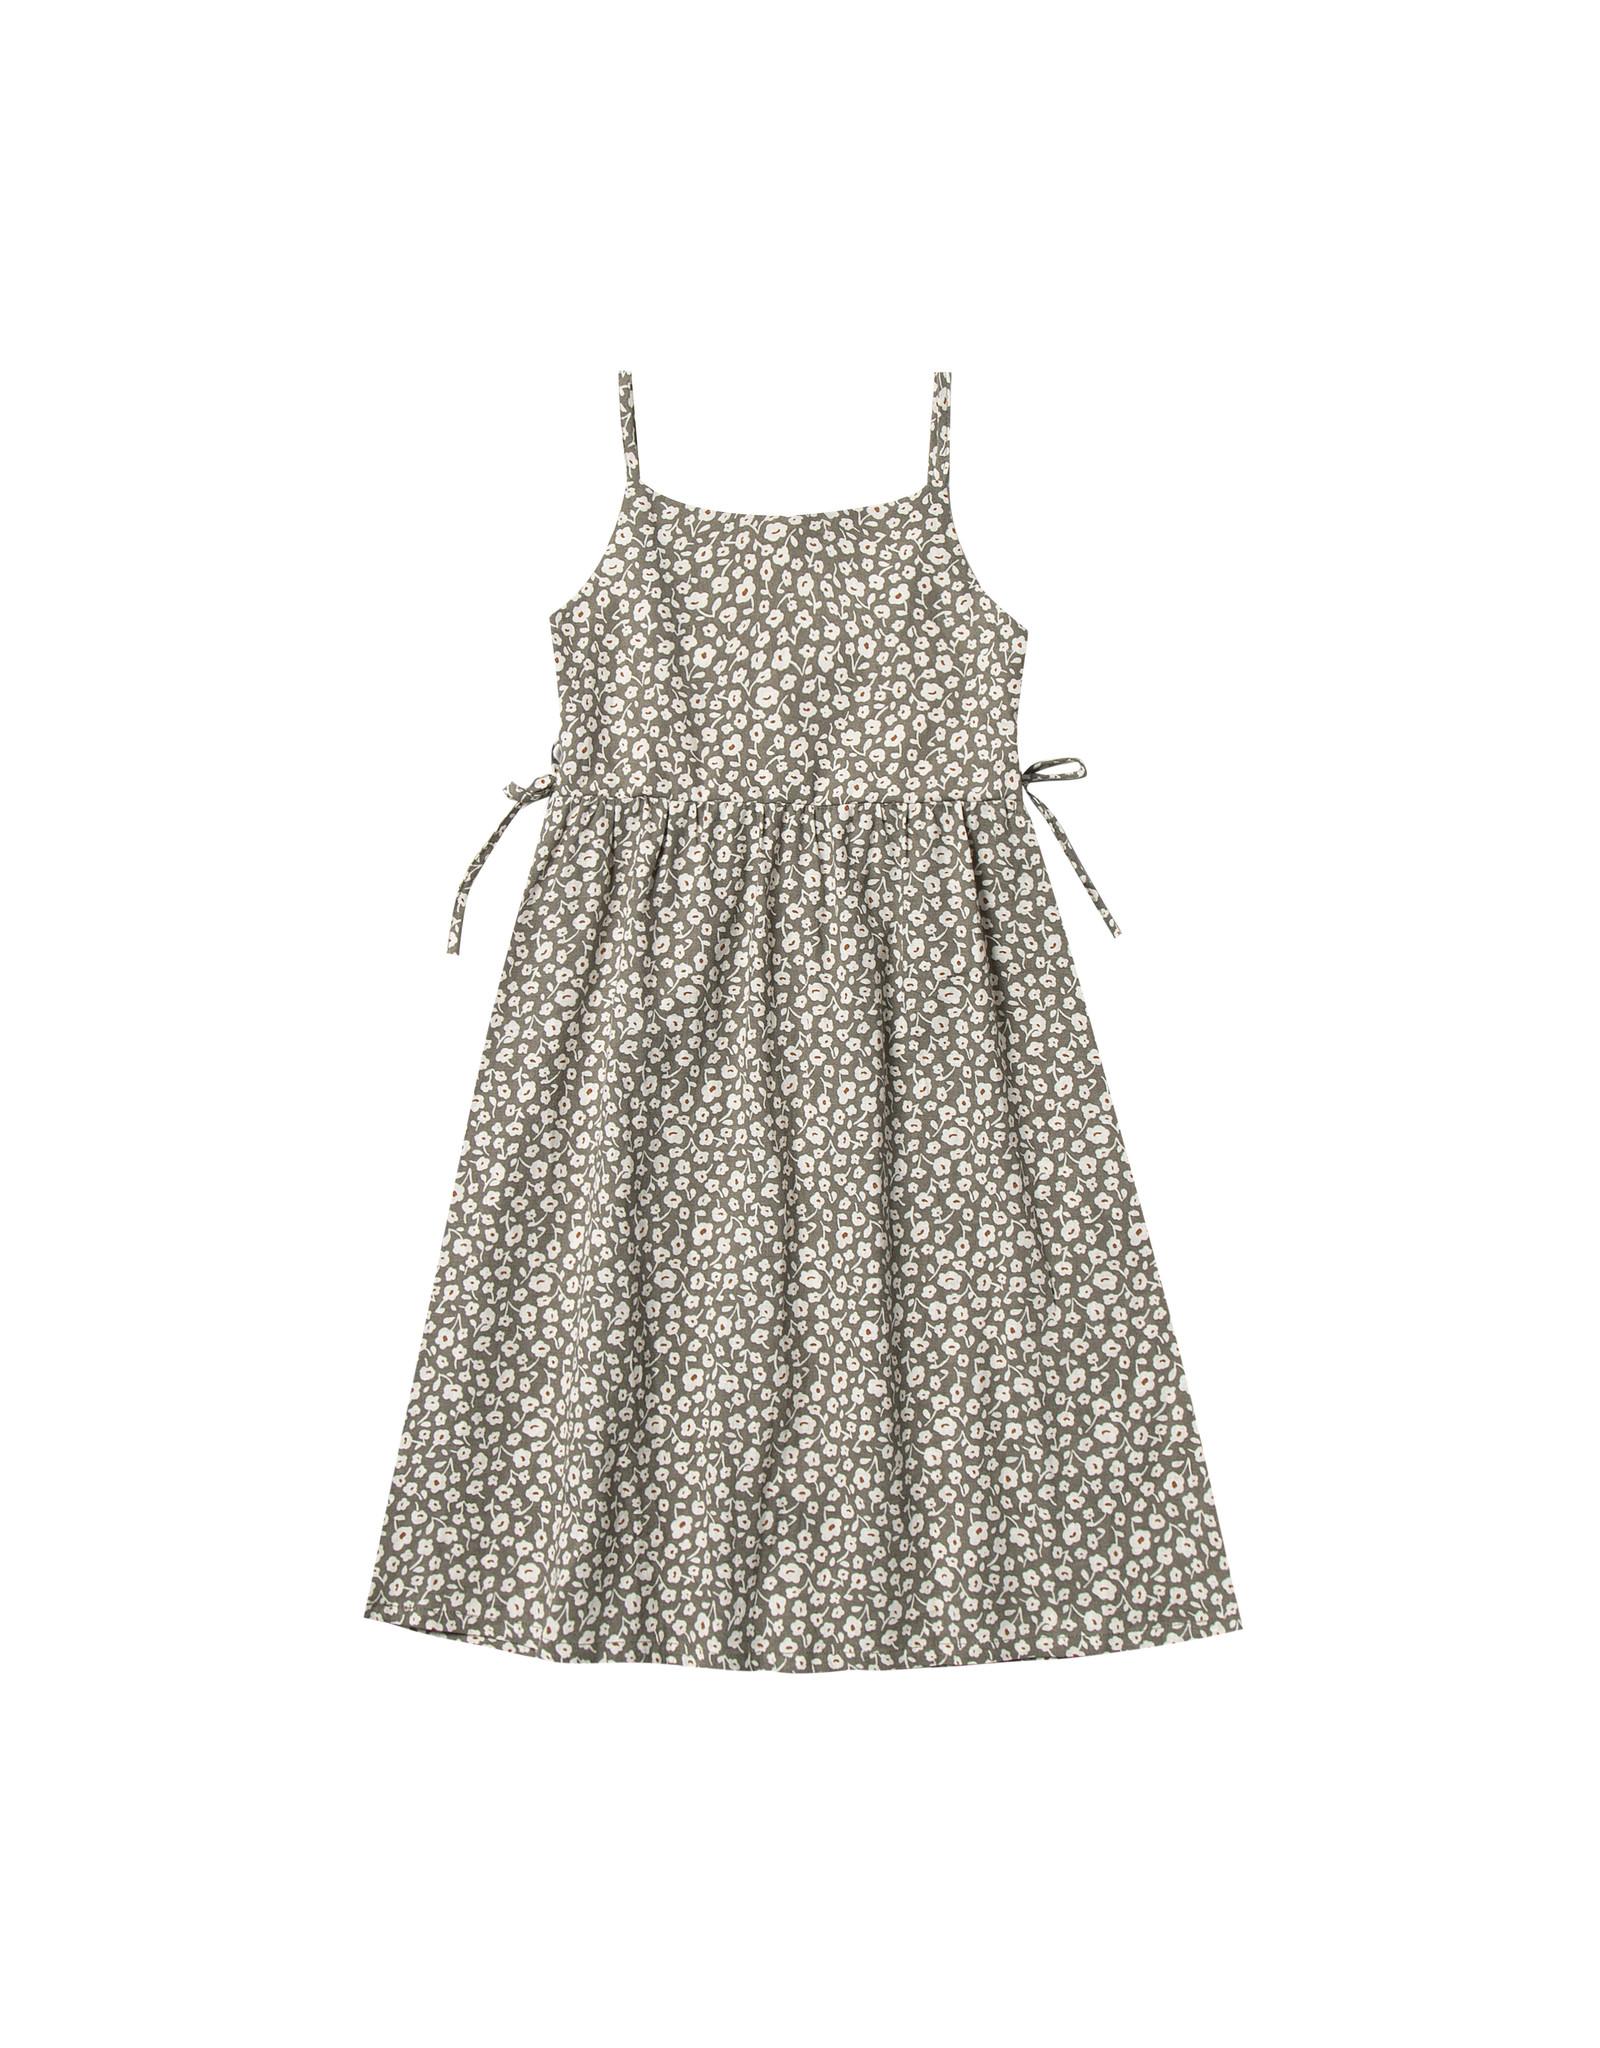 FLORA LACY DRESS - OLIVE